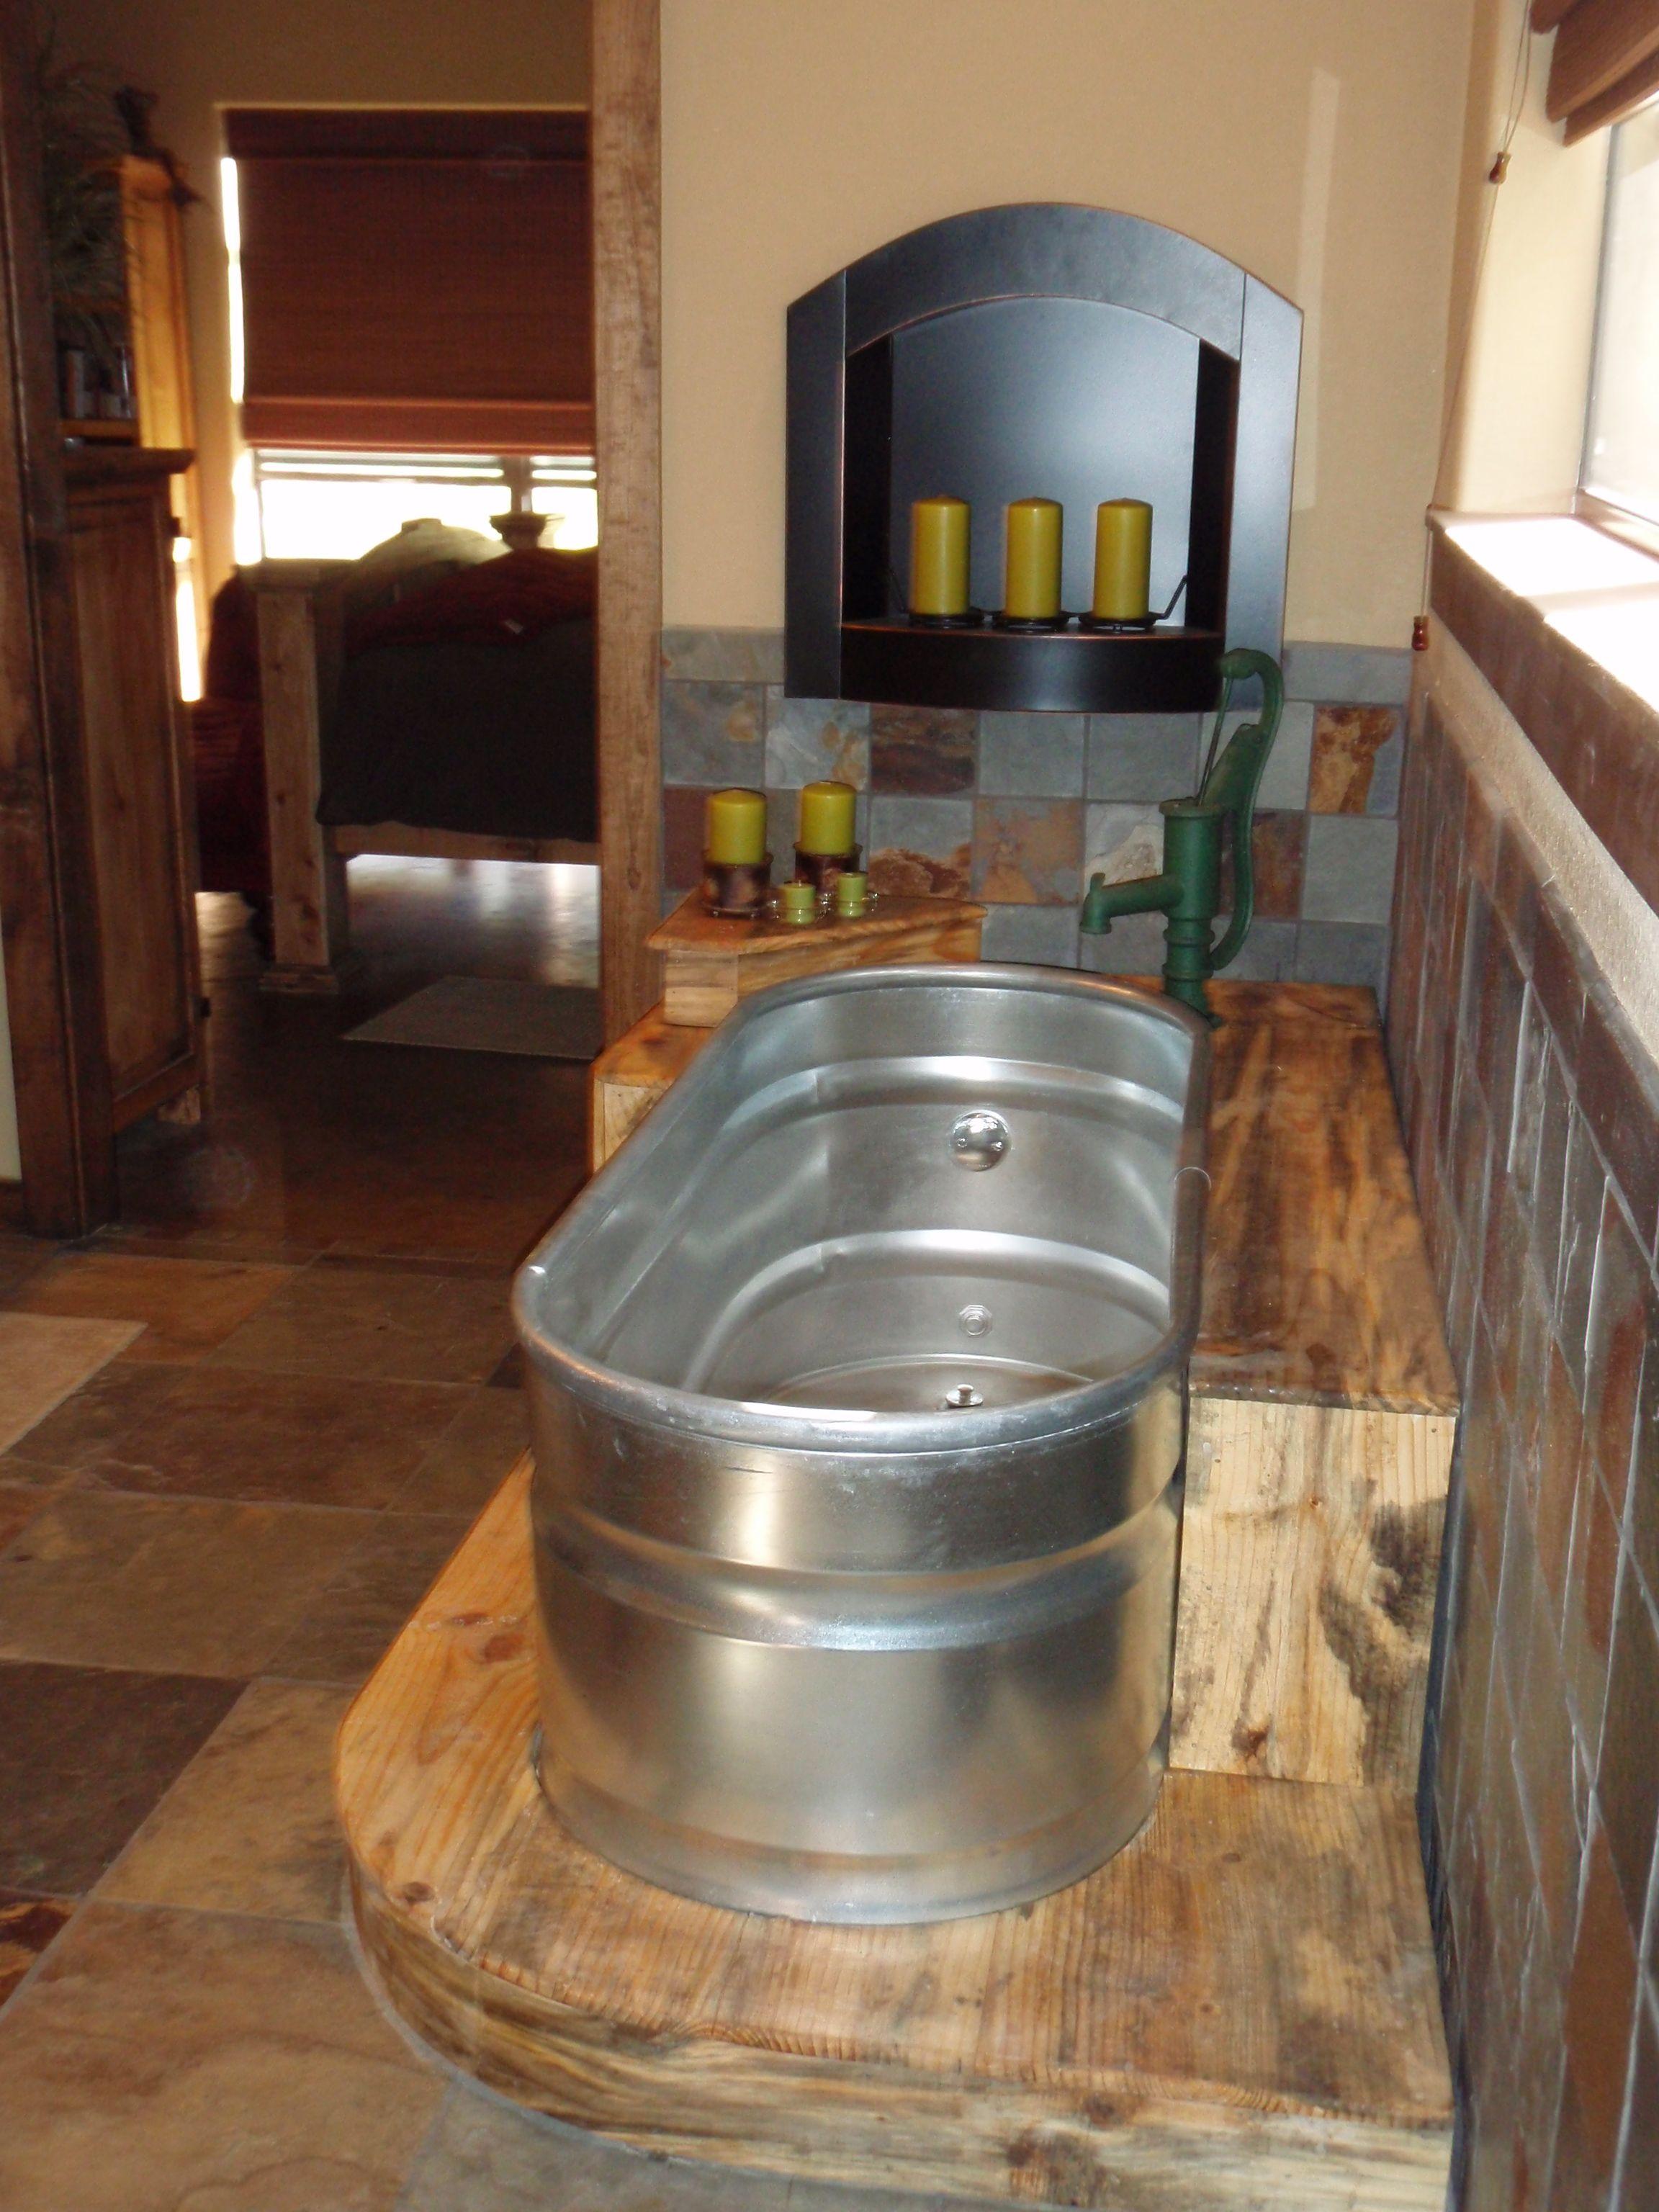 Feed Trough Bathtub With Old Hand Pump Faucet I Still Love It Tin Bathtub Galvanized Bathtub Country Style Bathrooms